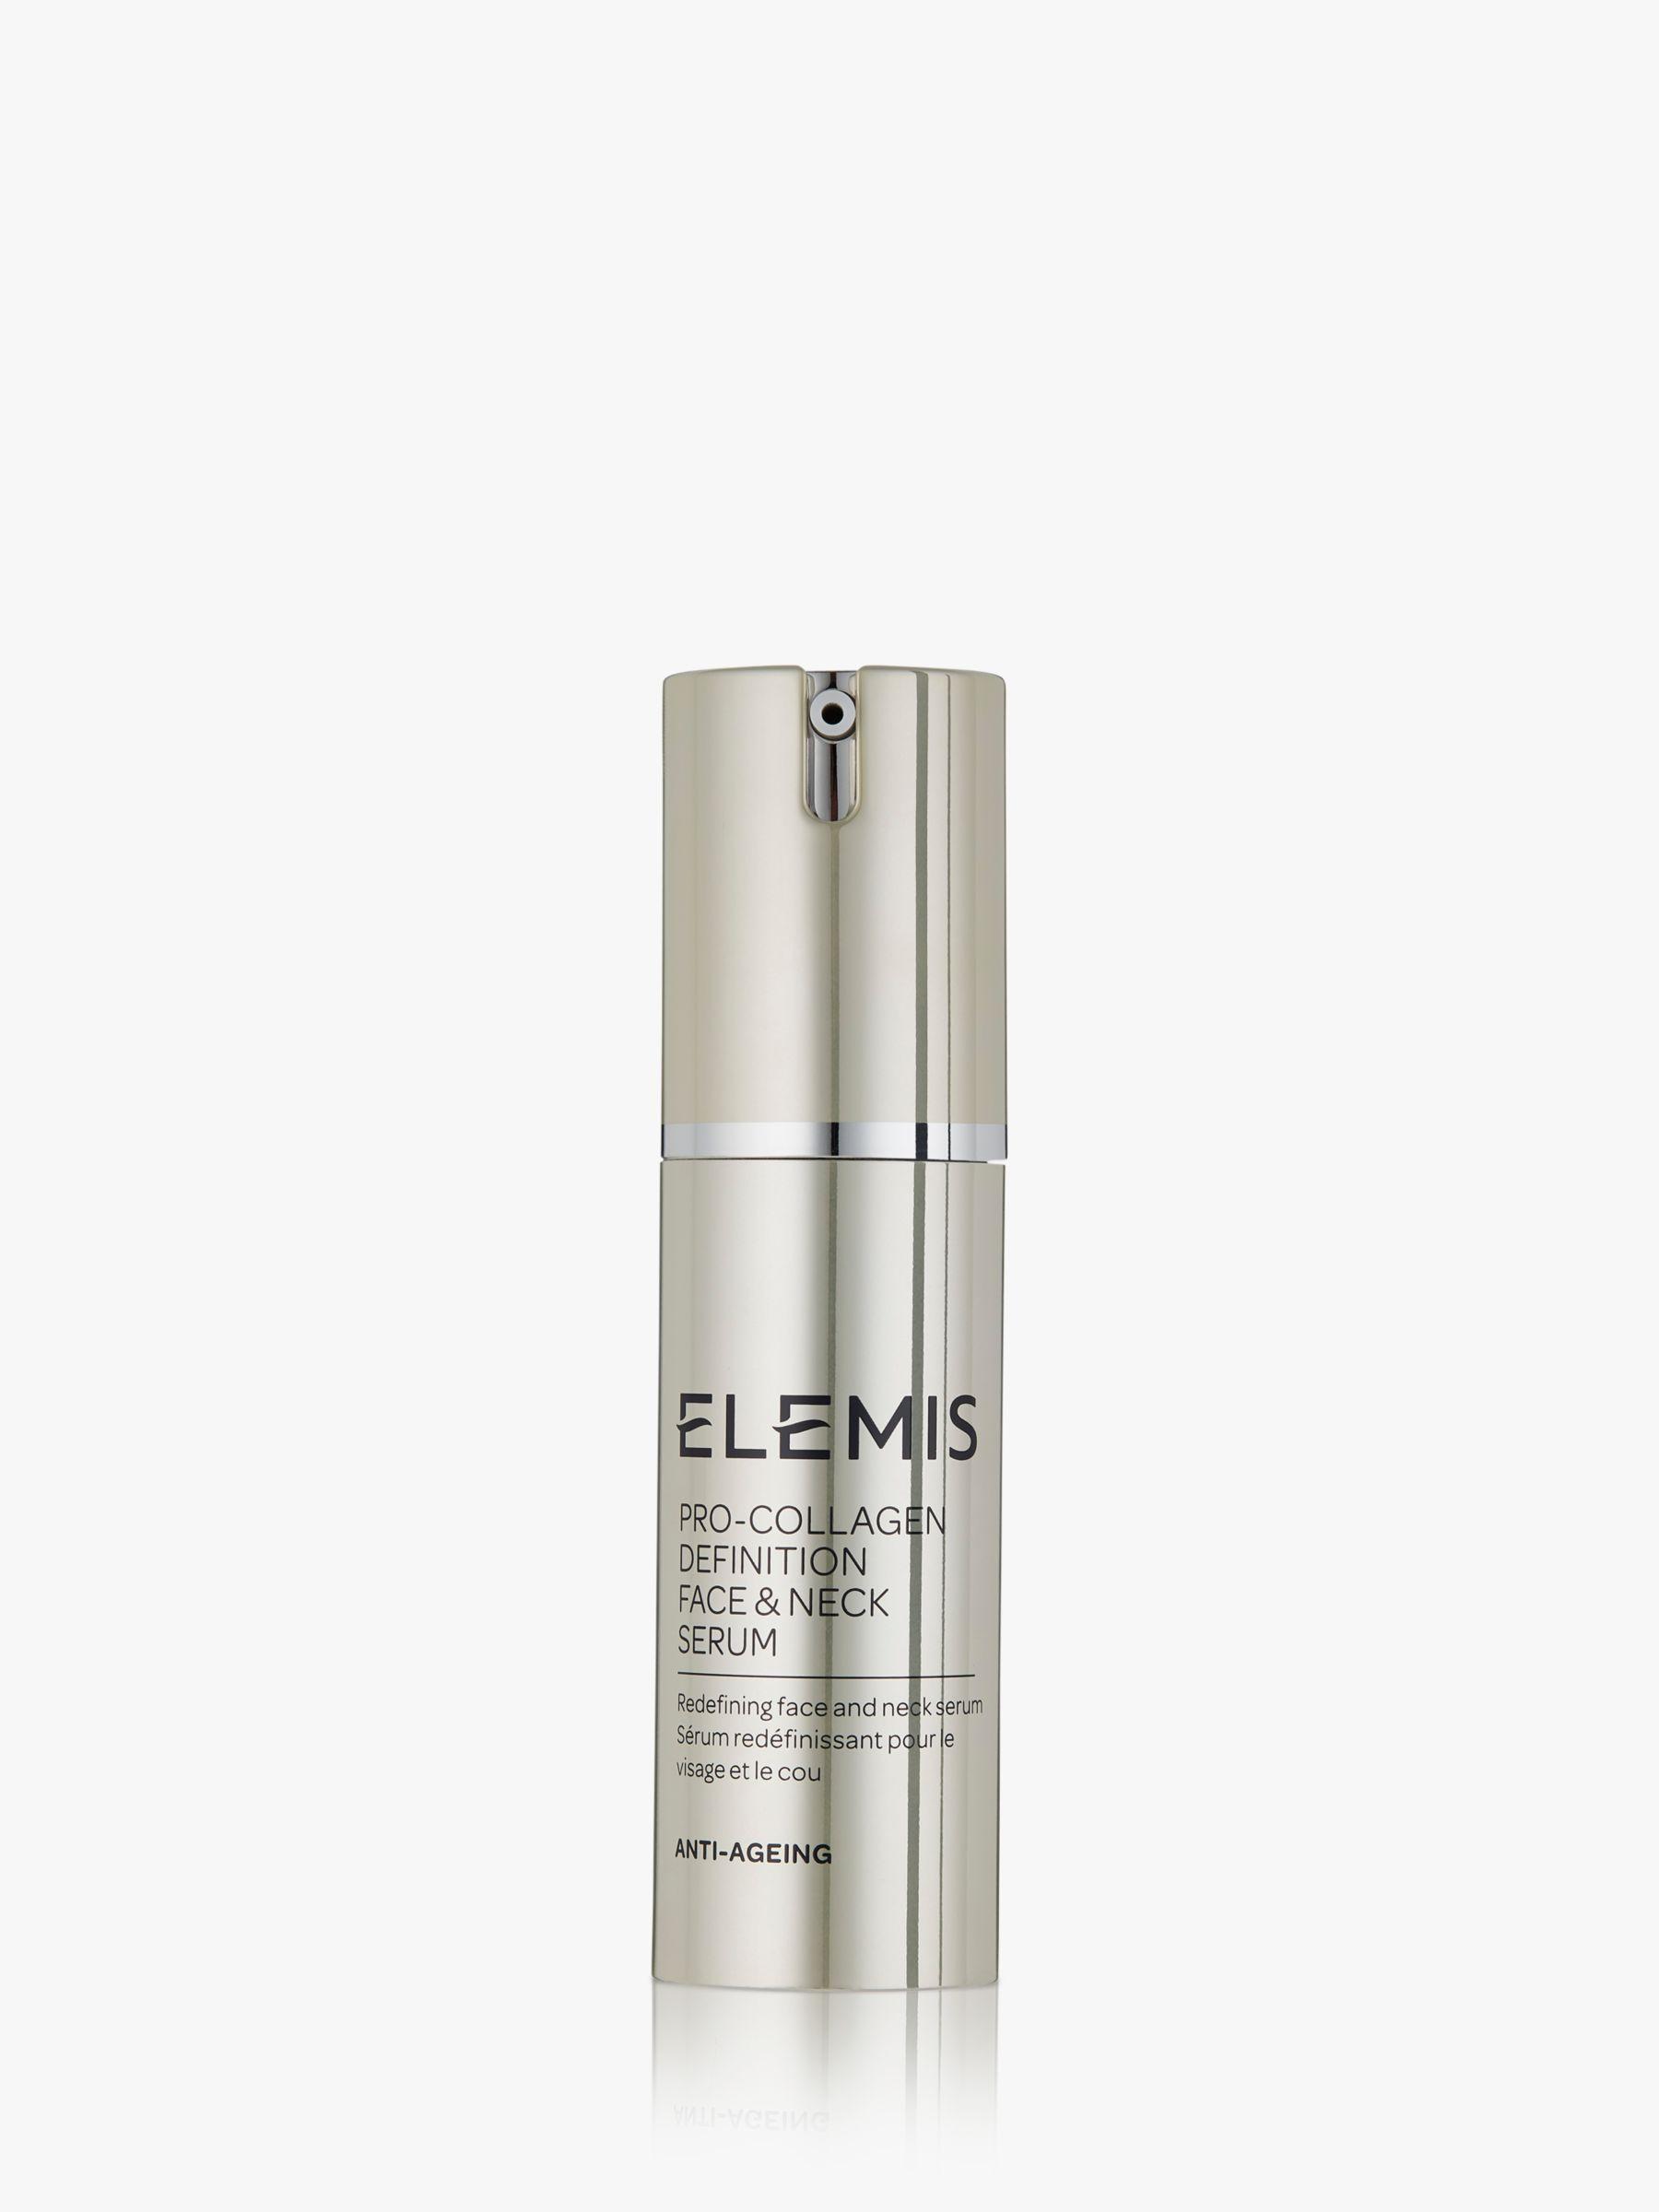 Elemis Elemis Pro-Collagen Definition Face & Neck Serum, 30ml